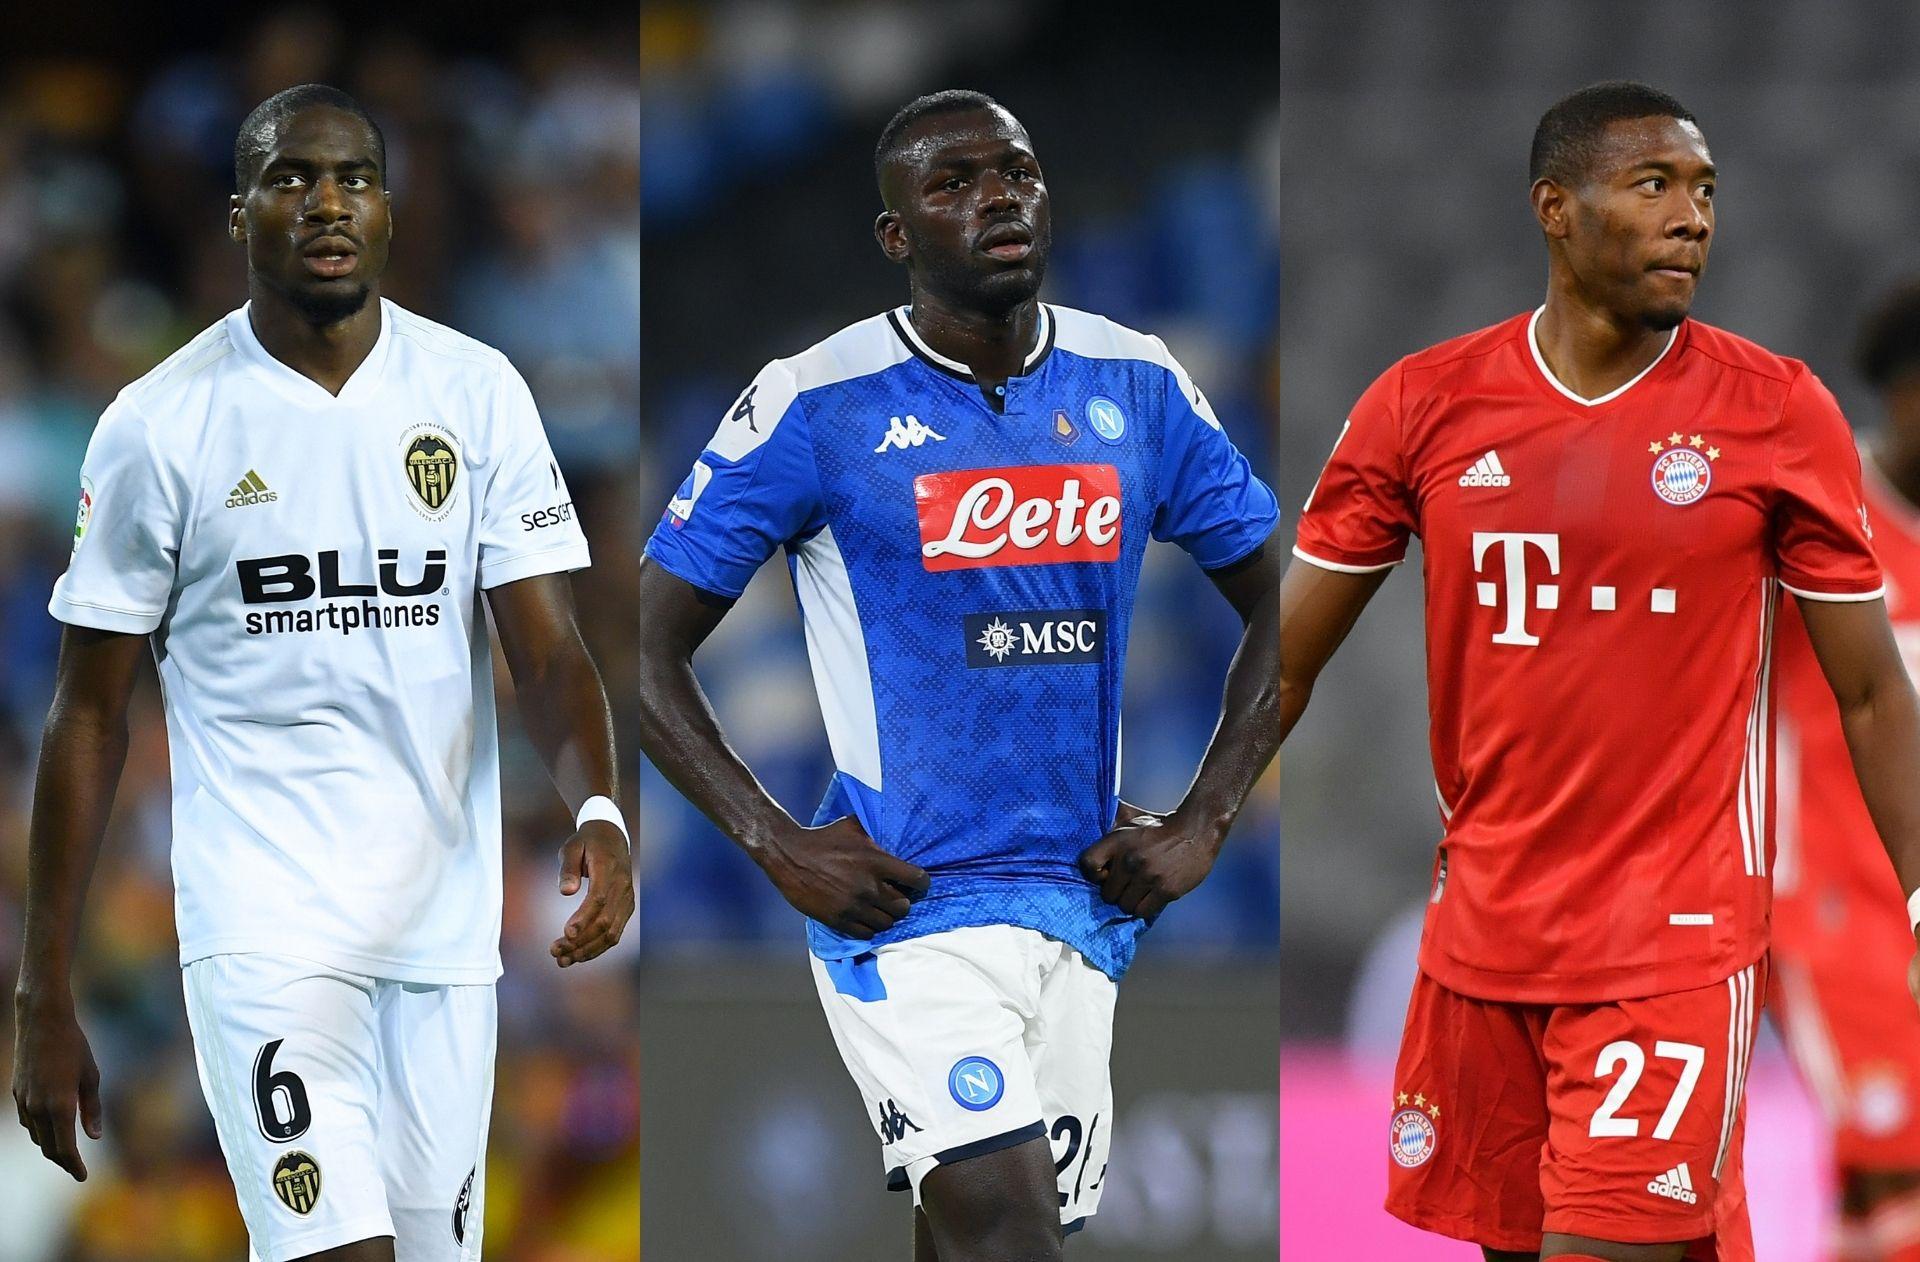 Saturday's transfer rumors - Liverpool to bid for Koulibaly?